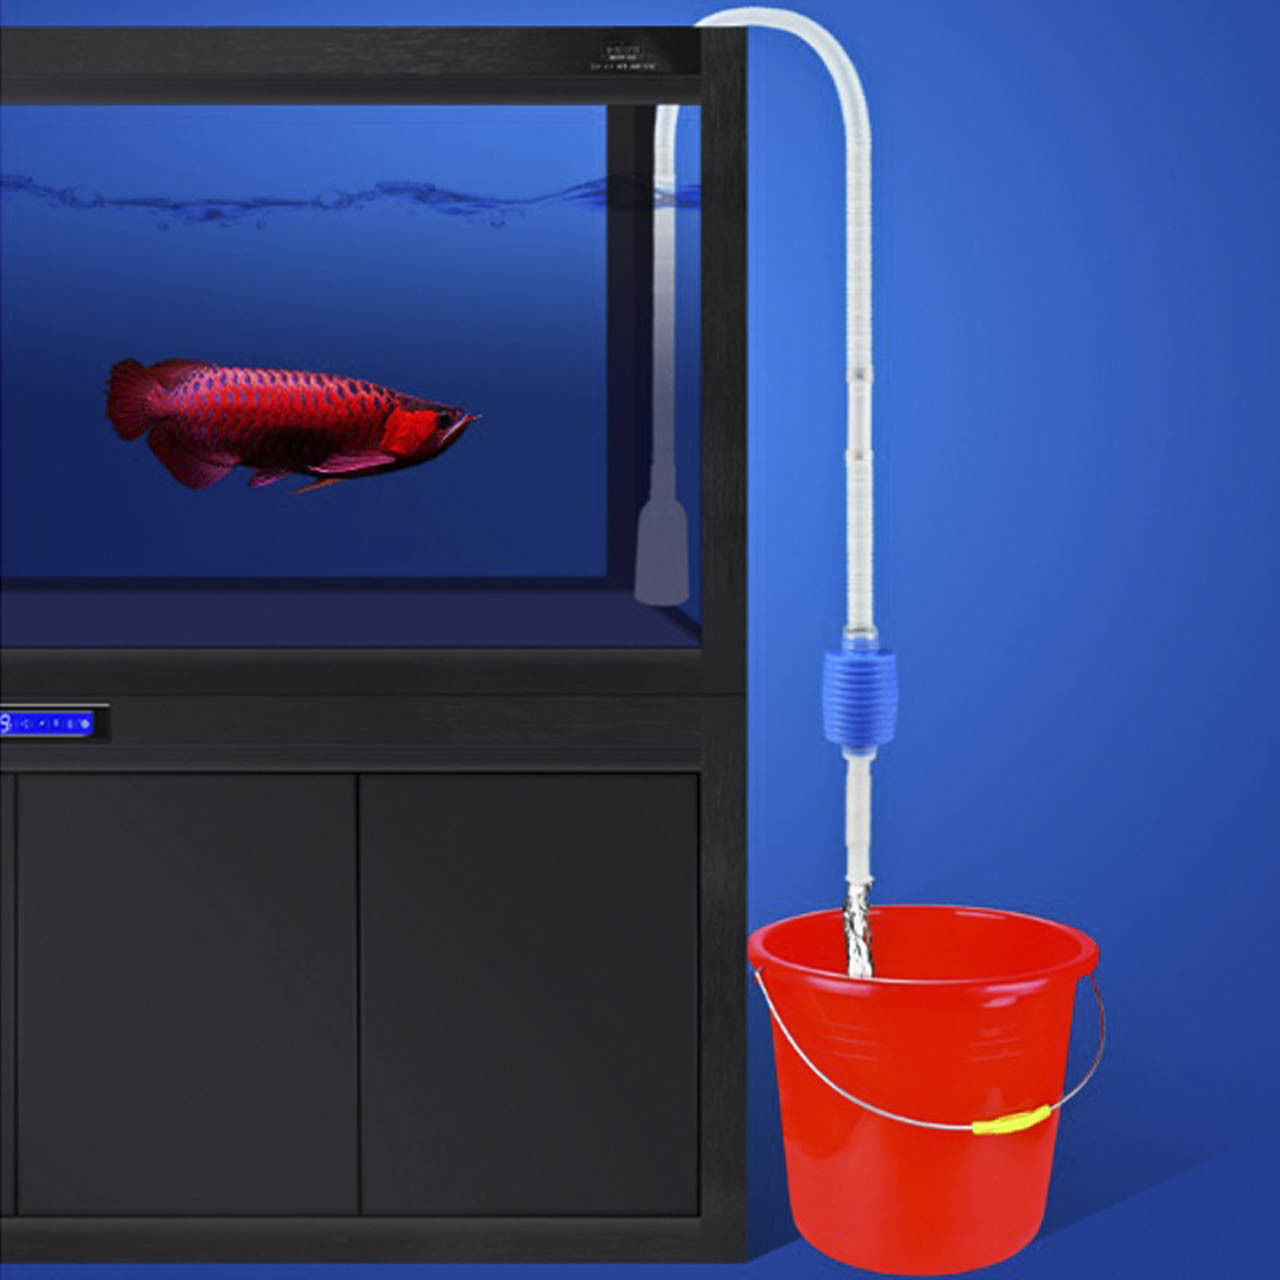 Useful Aquarium Water Filter Tool Fish Tank Cleaner Gravel Vacuum Cleaning Siphon Pump Air Pumps & Accessories